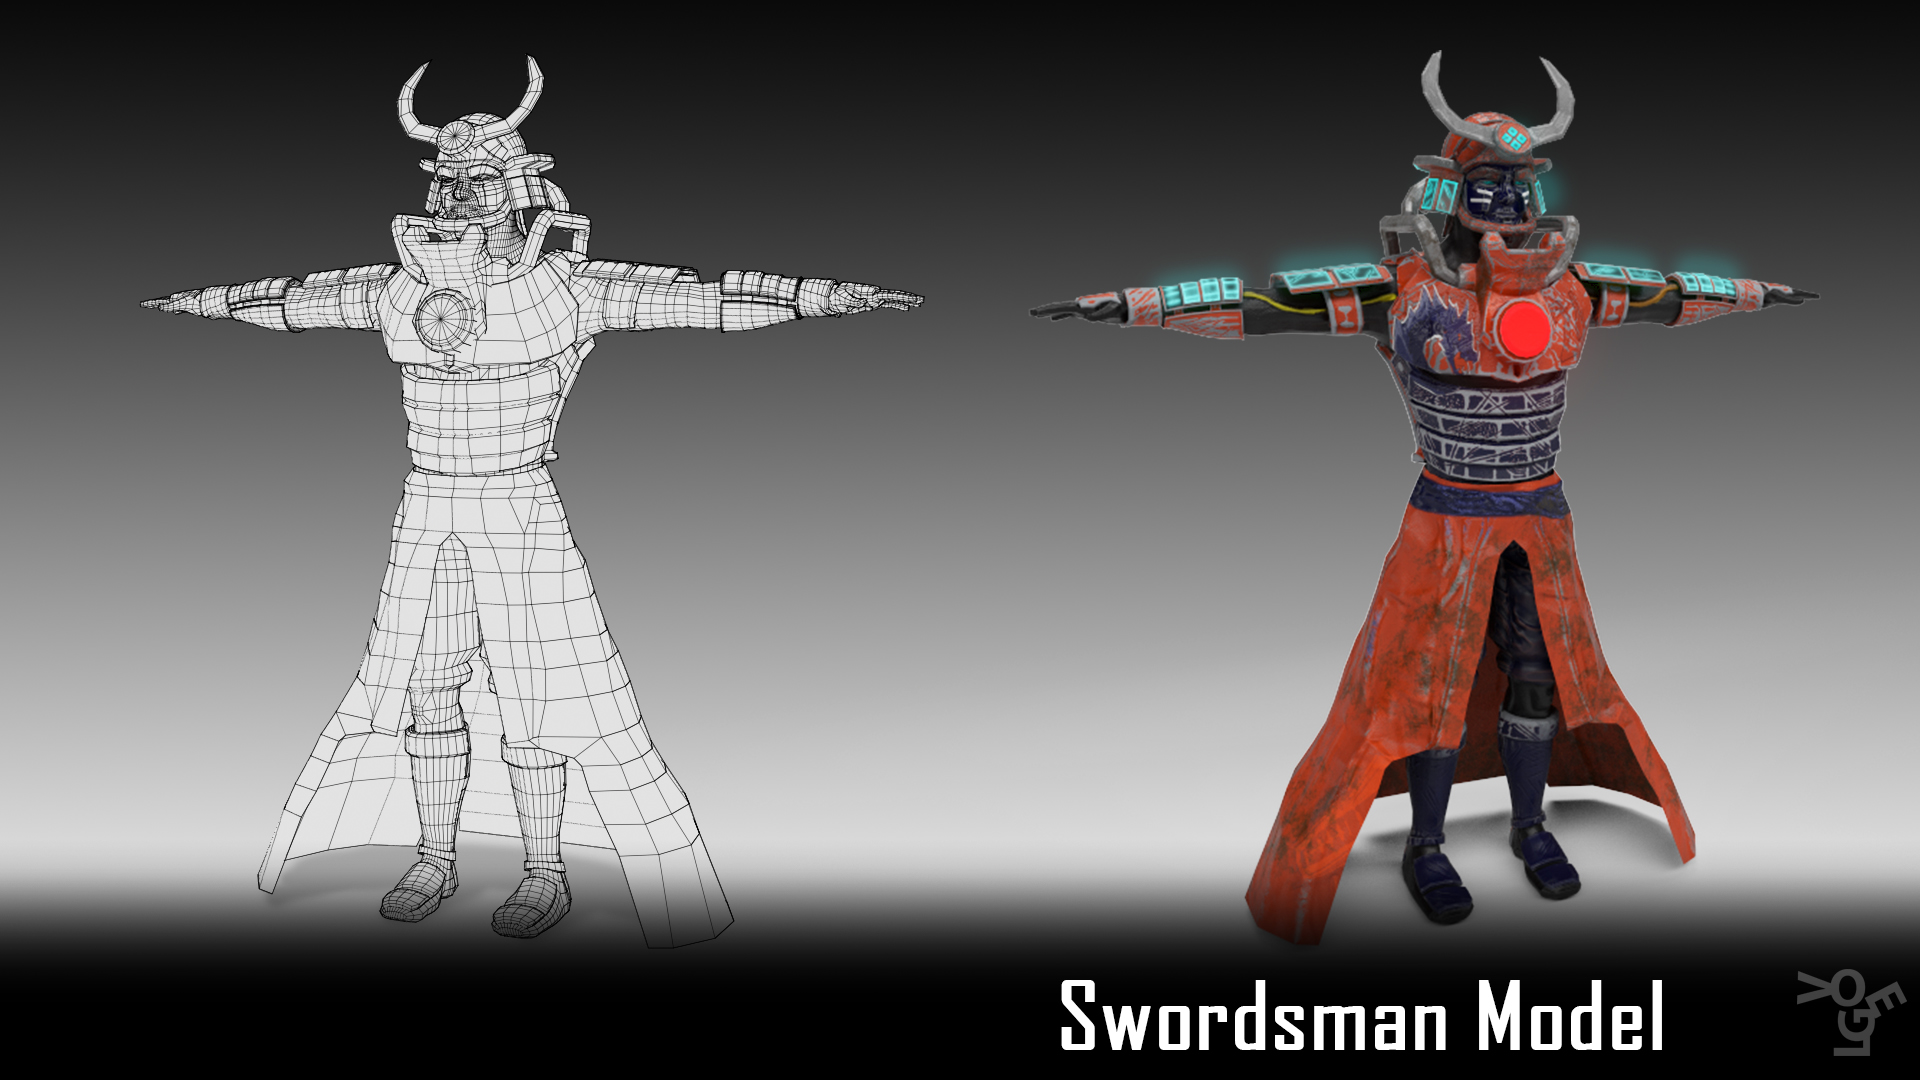 SwordsmanModel